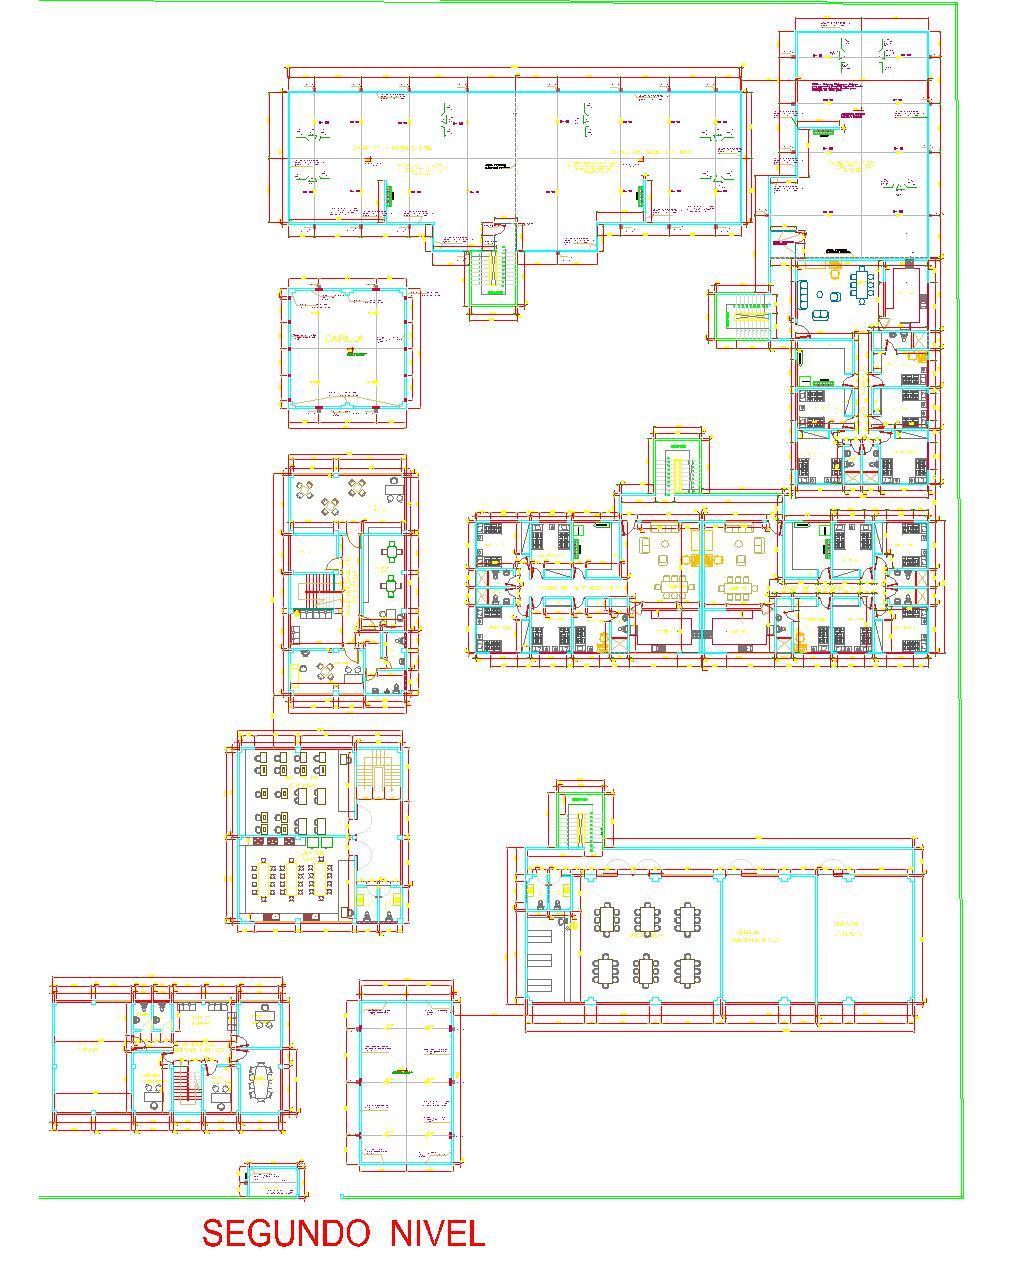 children-shelter2 Emergency Plan For Nursing Home on office building emergency plan, day care emergency plan, hospital emergency plan,